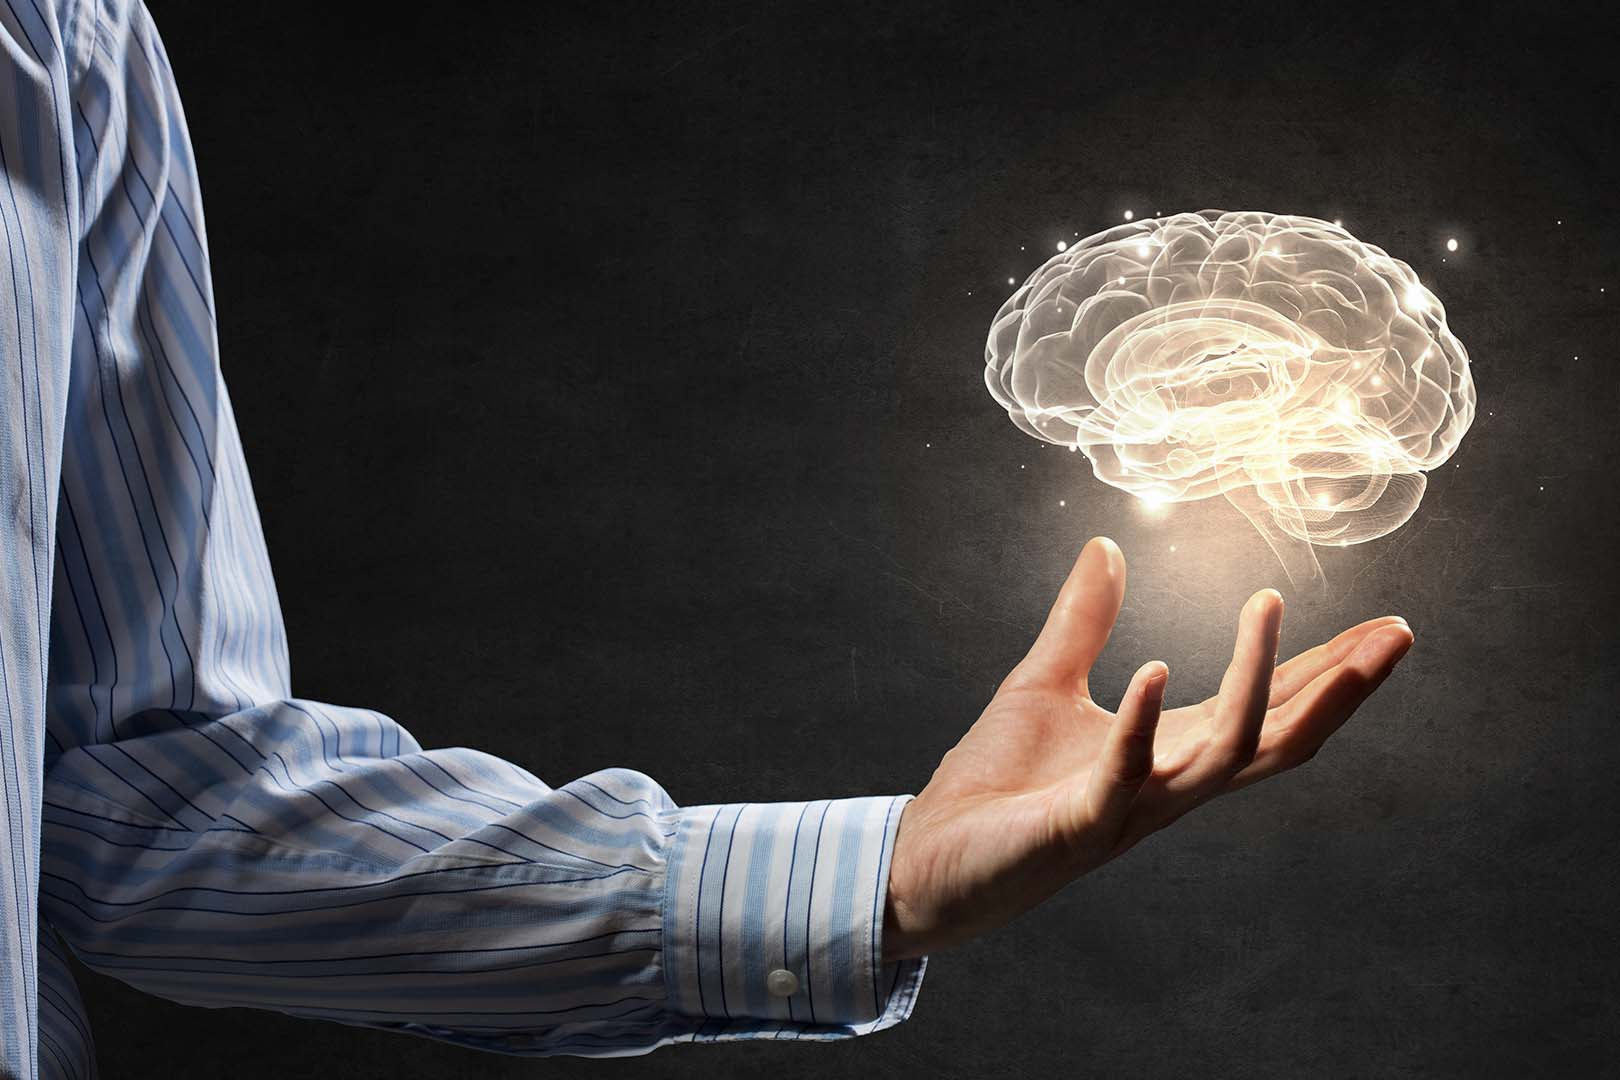 12 Cara Meningkatkan Daya Ingat dan Konsentrasi - Jovee.id